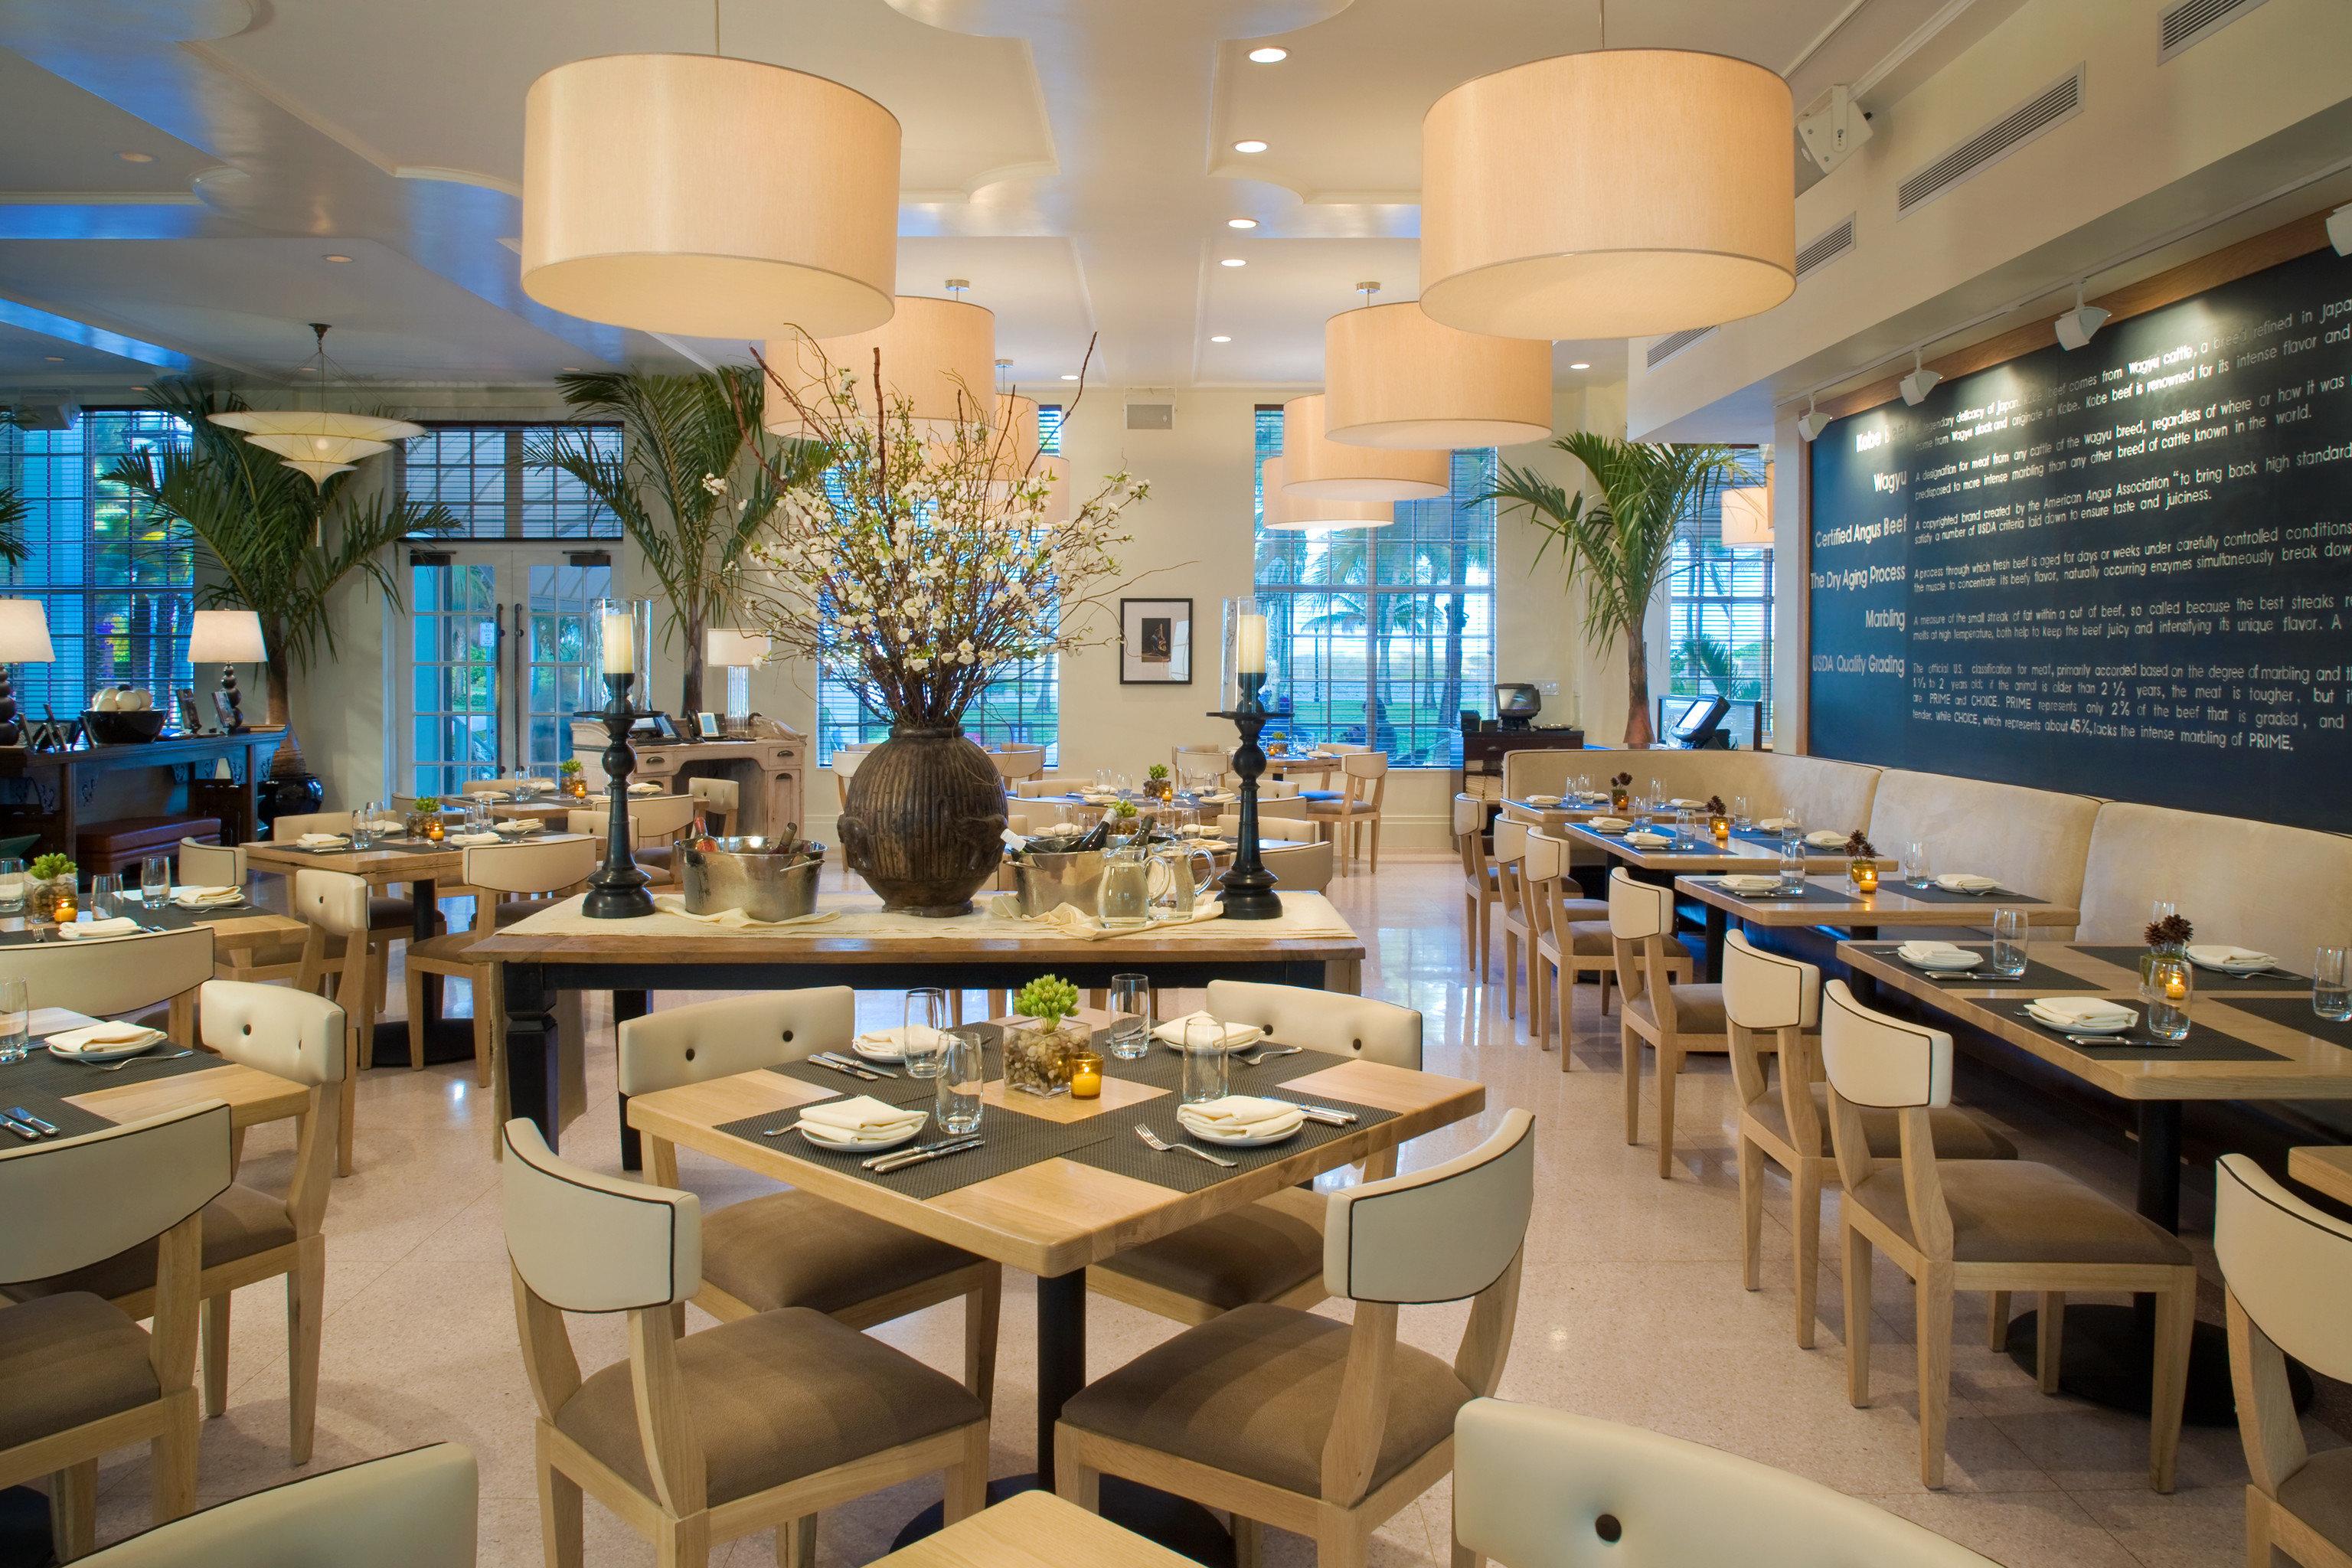 Dining Drink Eat Resort chair property restaurant condominium café function hall cafeteria